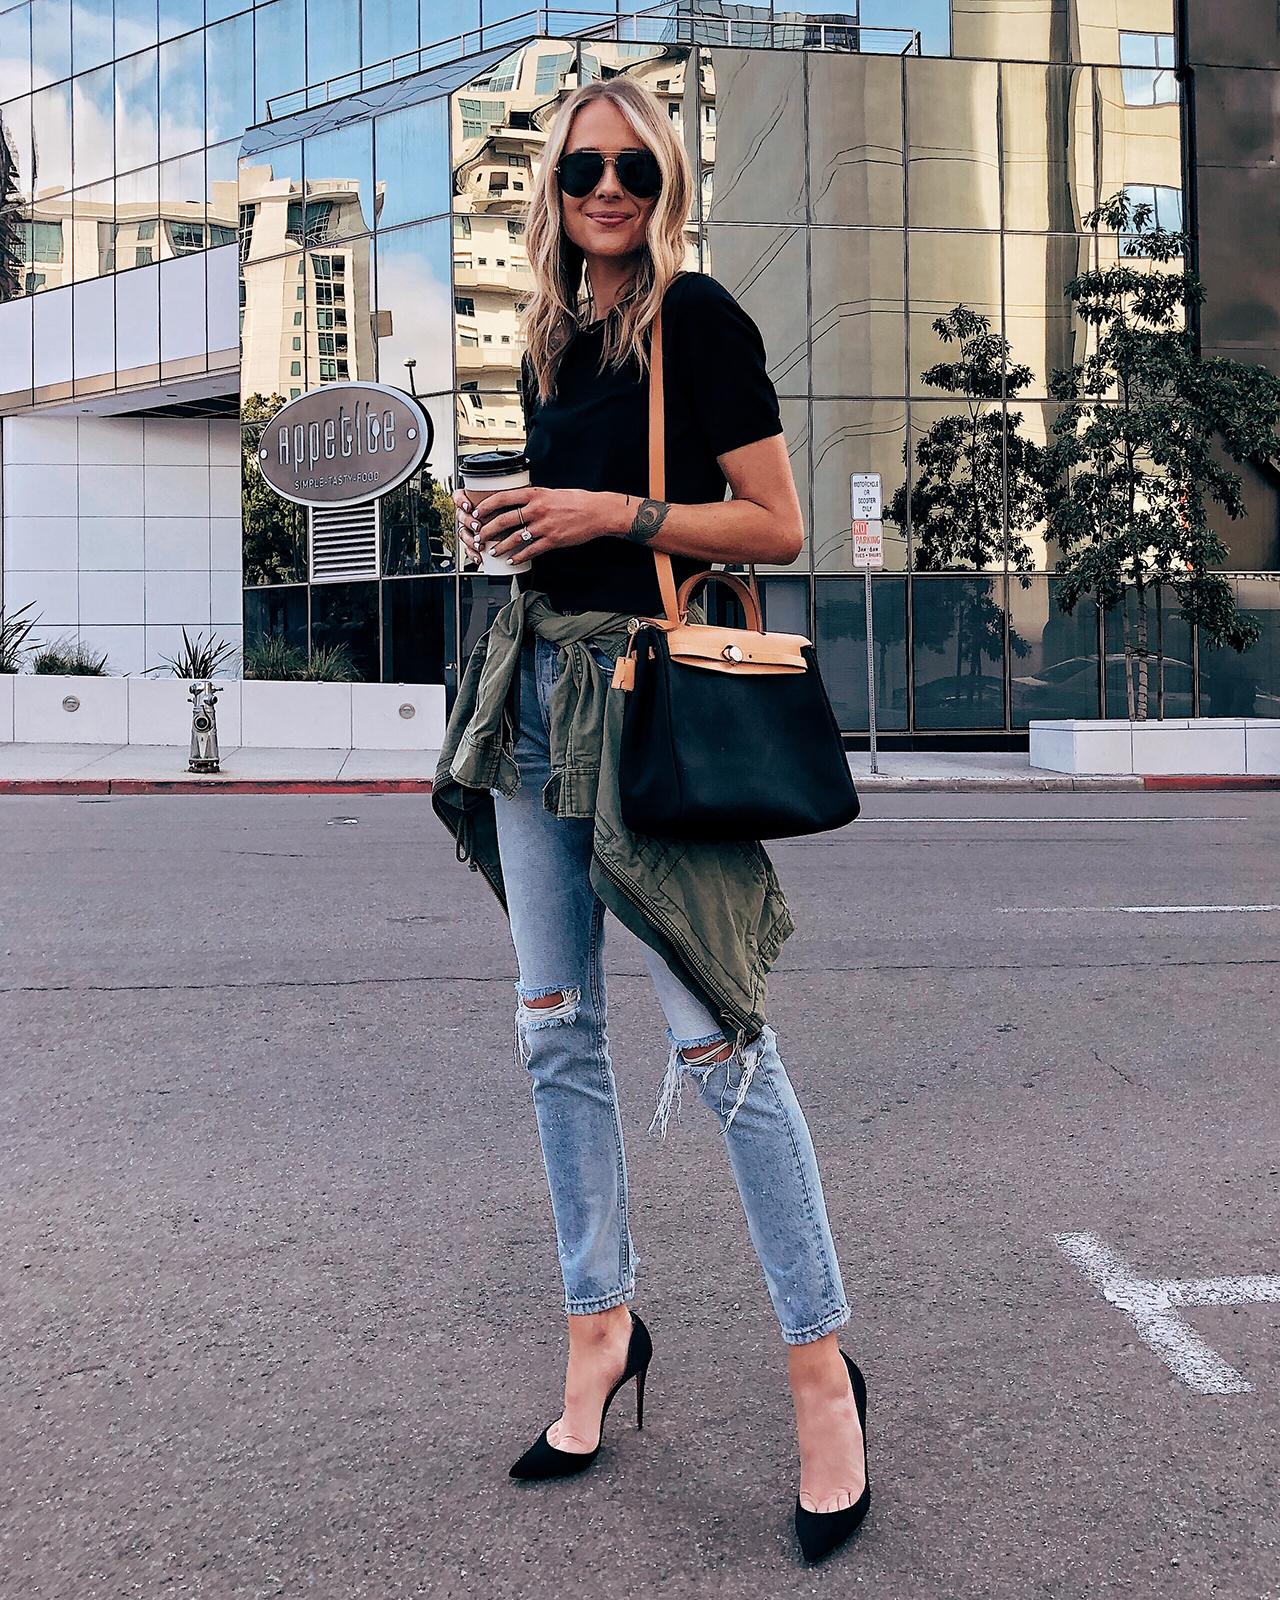 Fashion Jackson Wearing Black Top Ripped Skinny Jeans Green Utility Jacket Black Heels Hermes Herbag